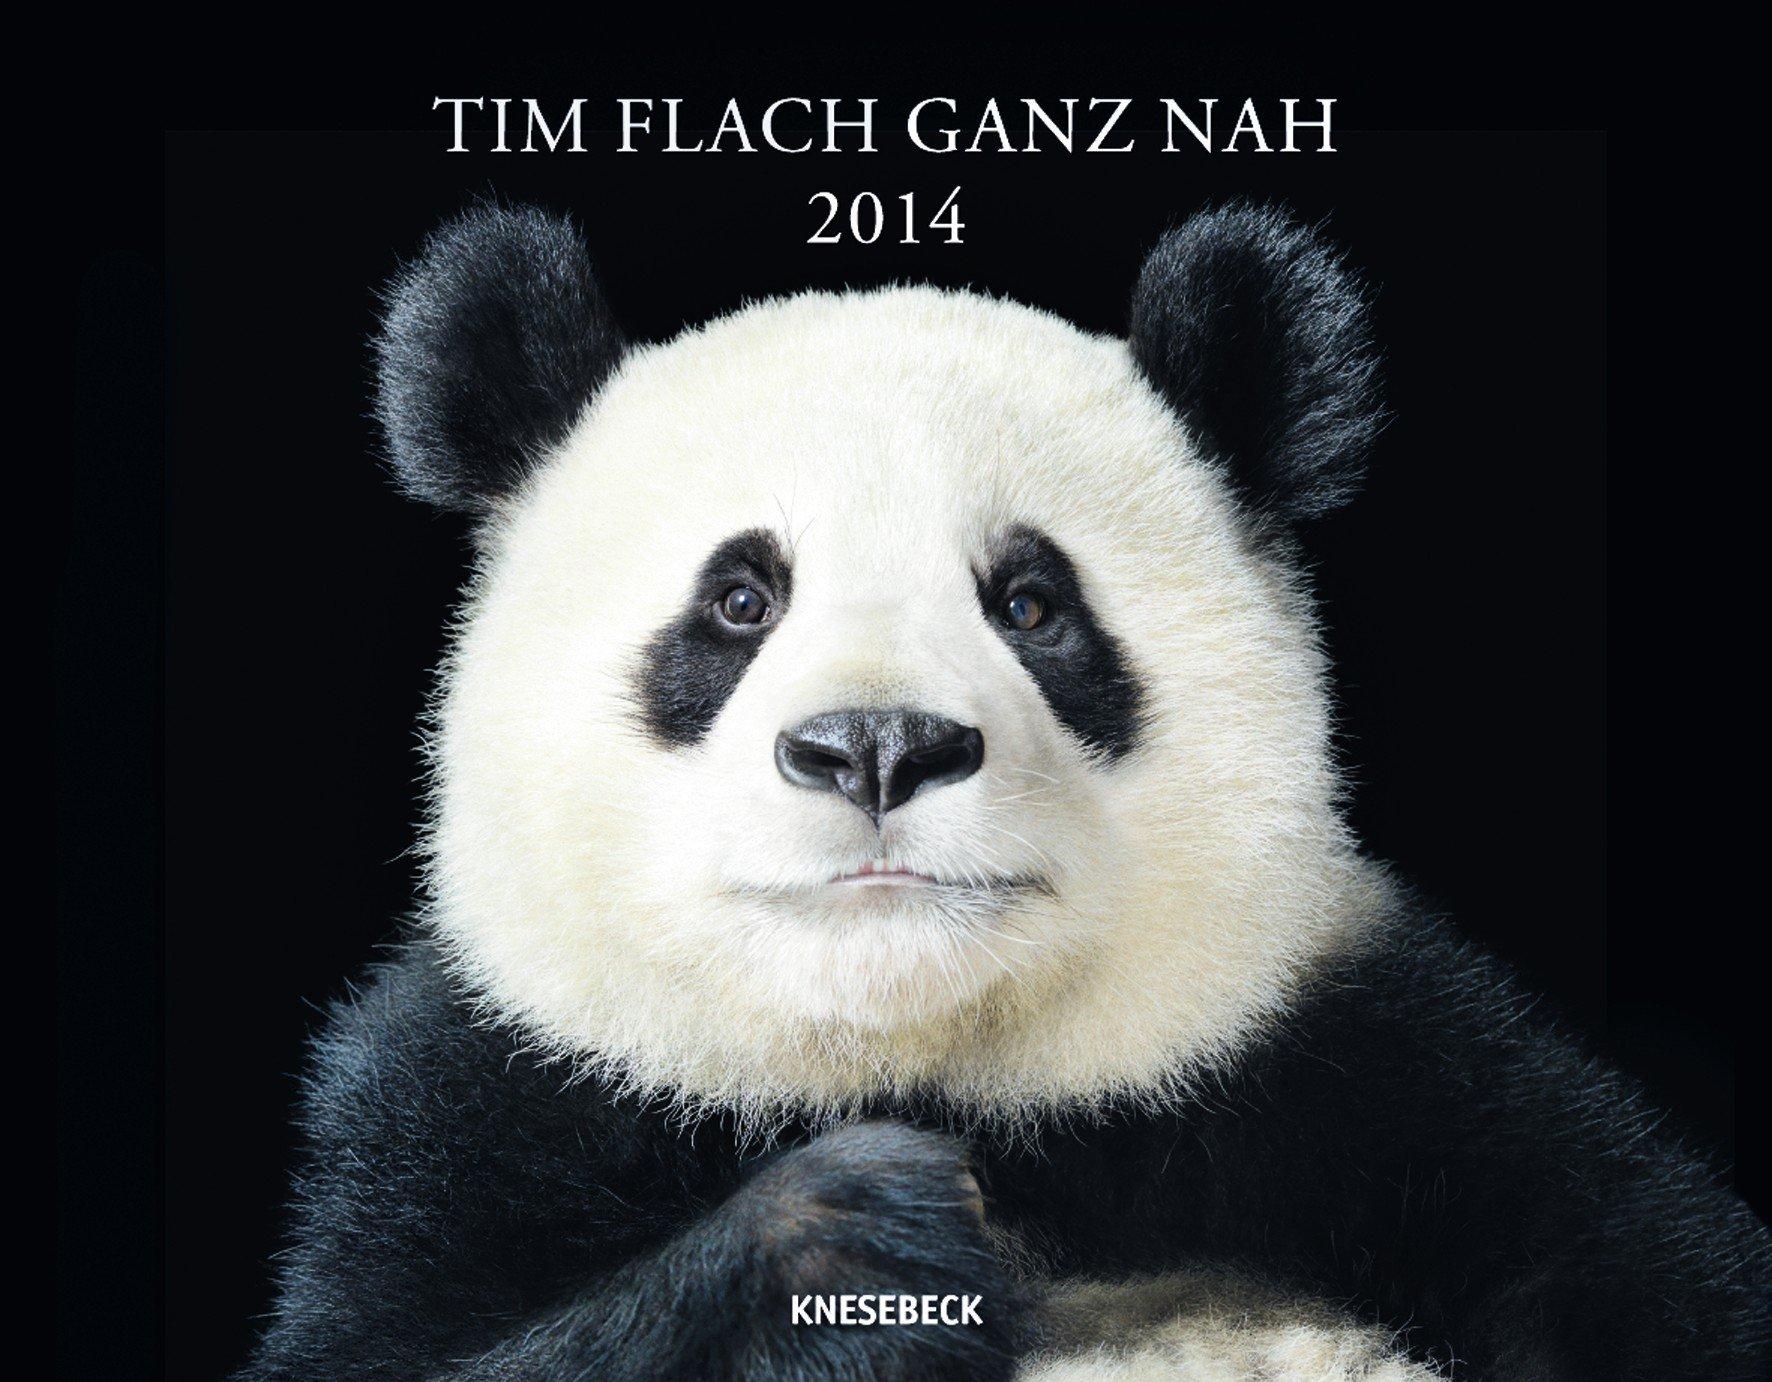 ganz-nah-2014